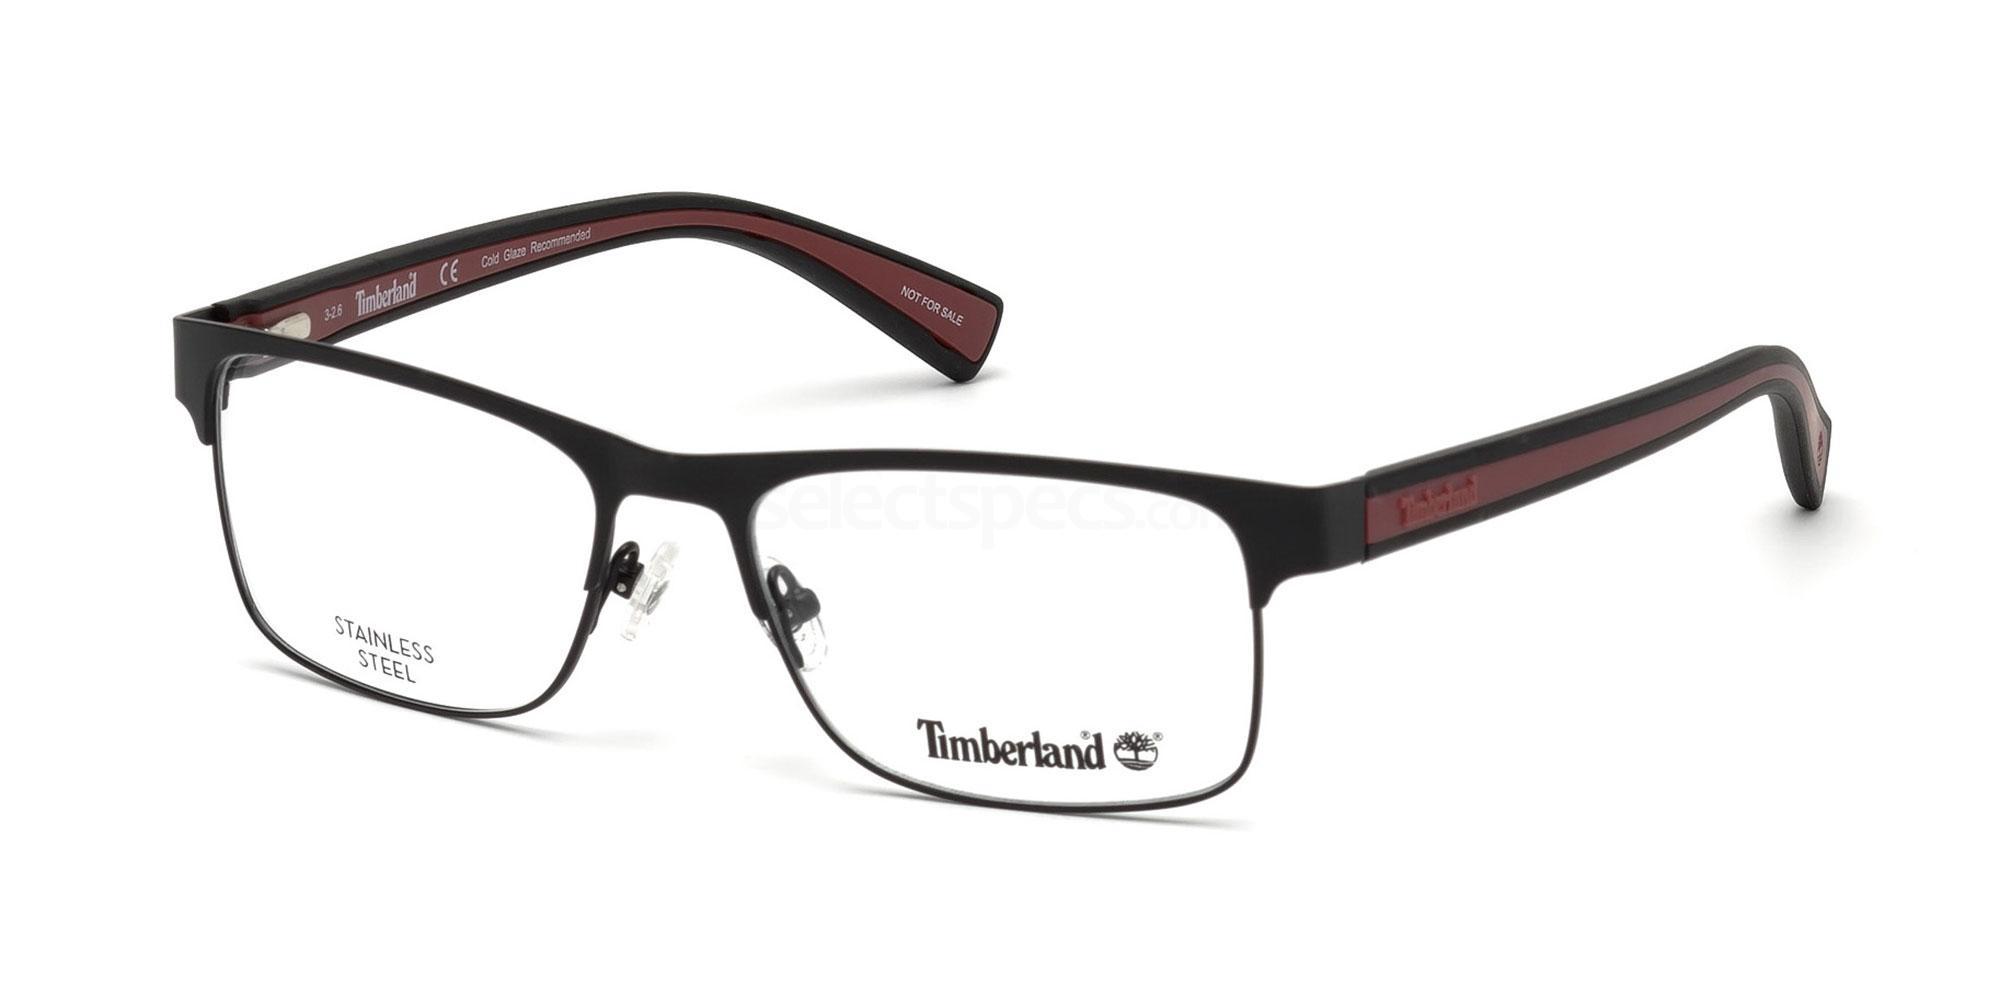 002 TB1573 Glasses, Timberland